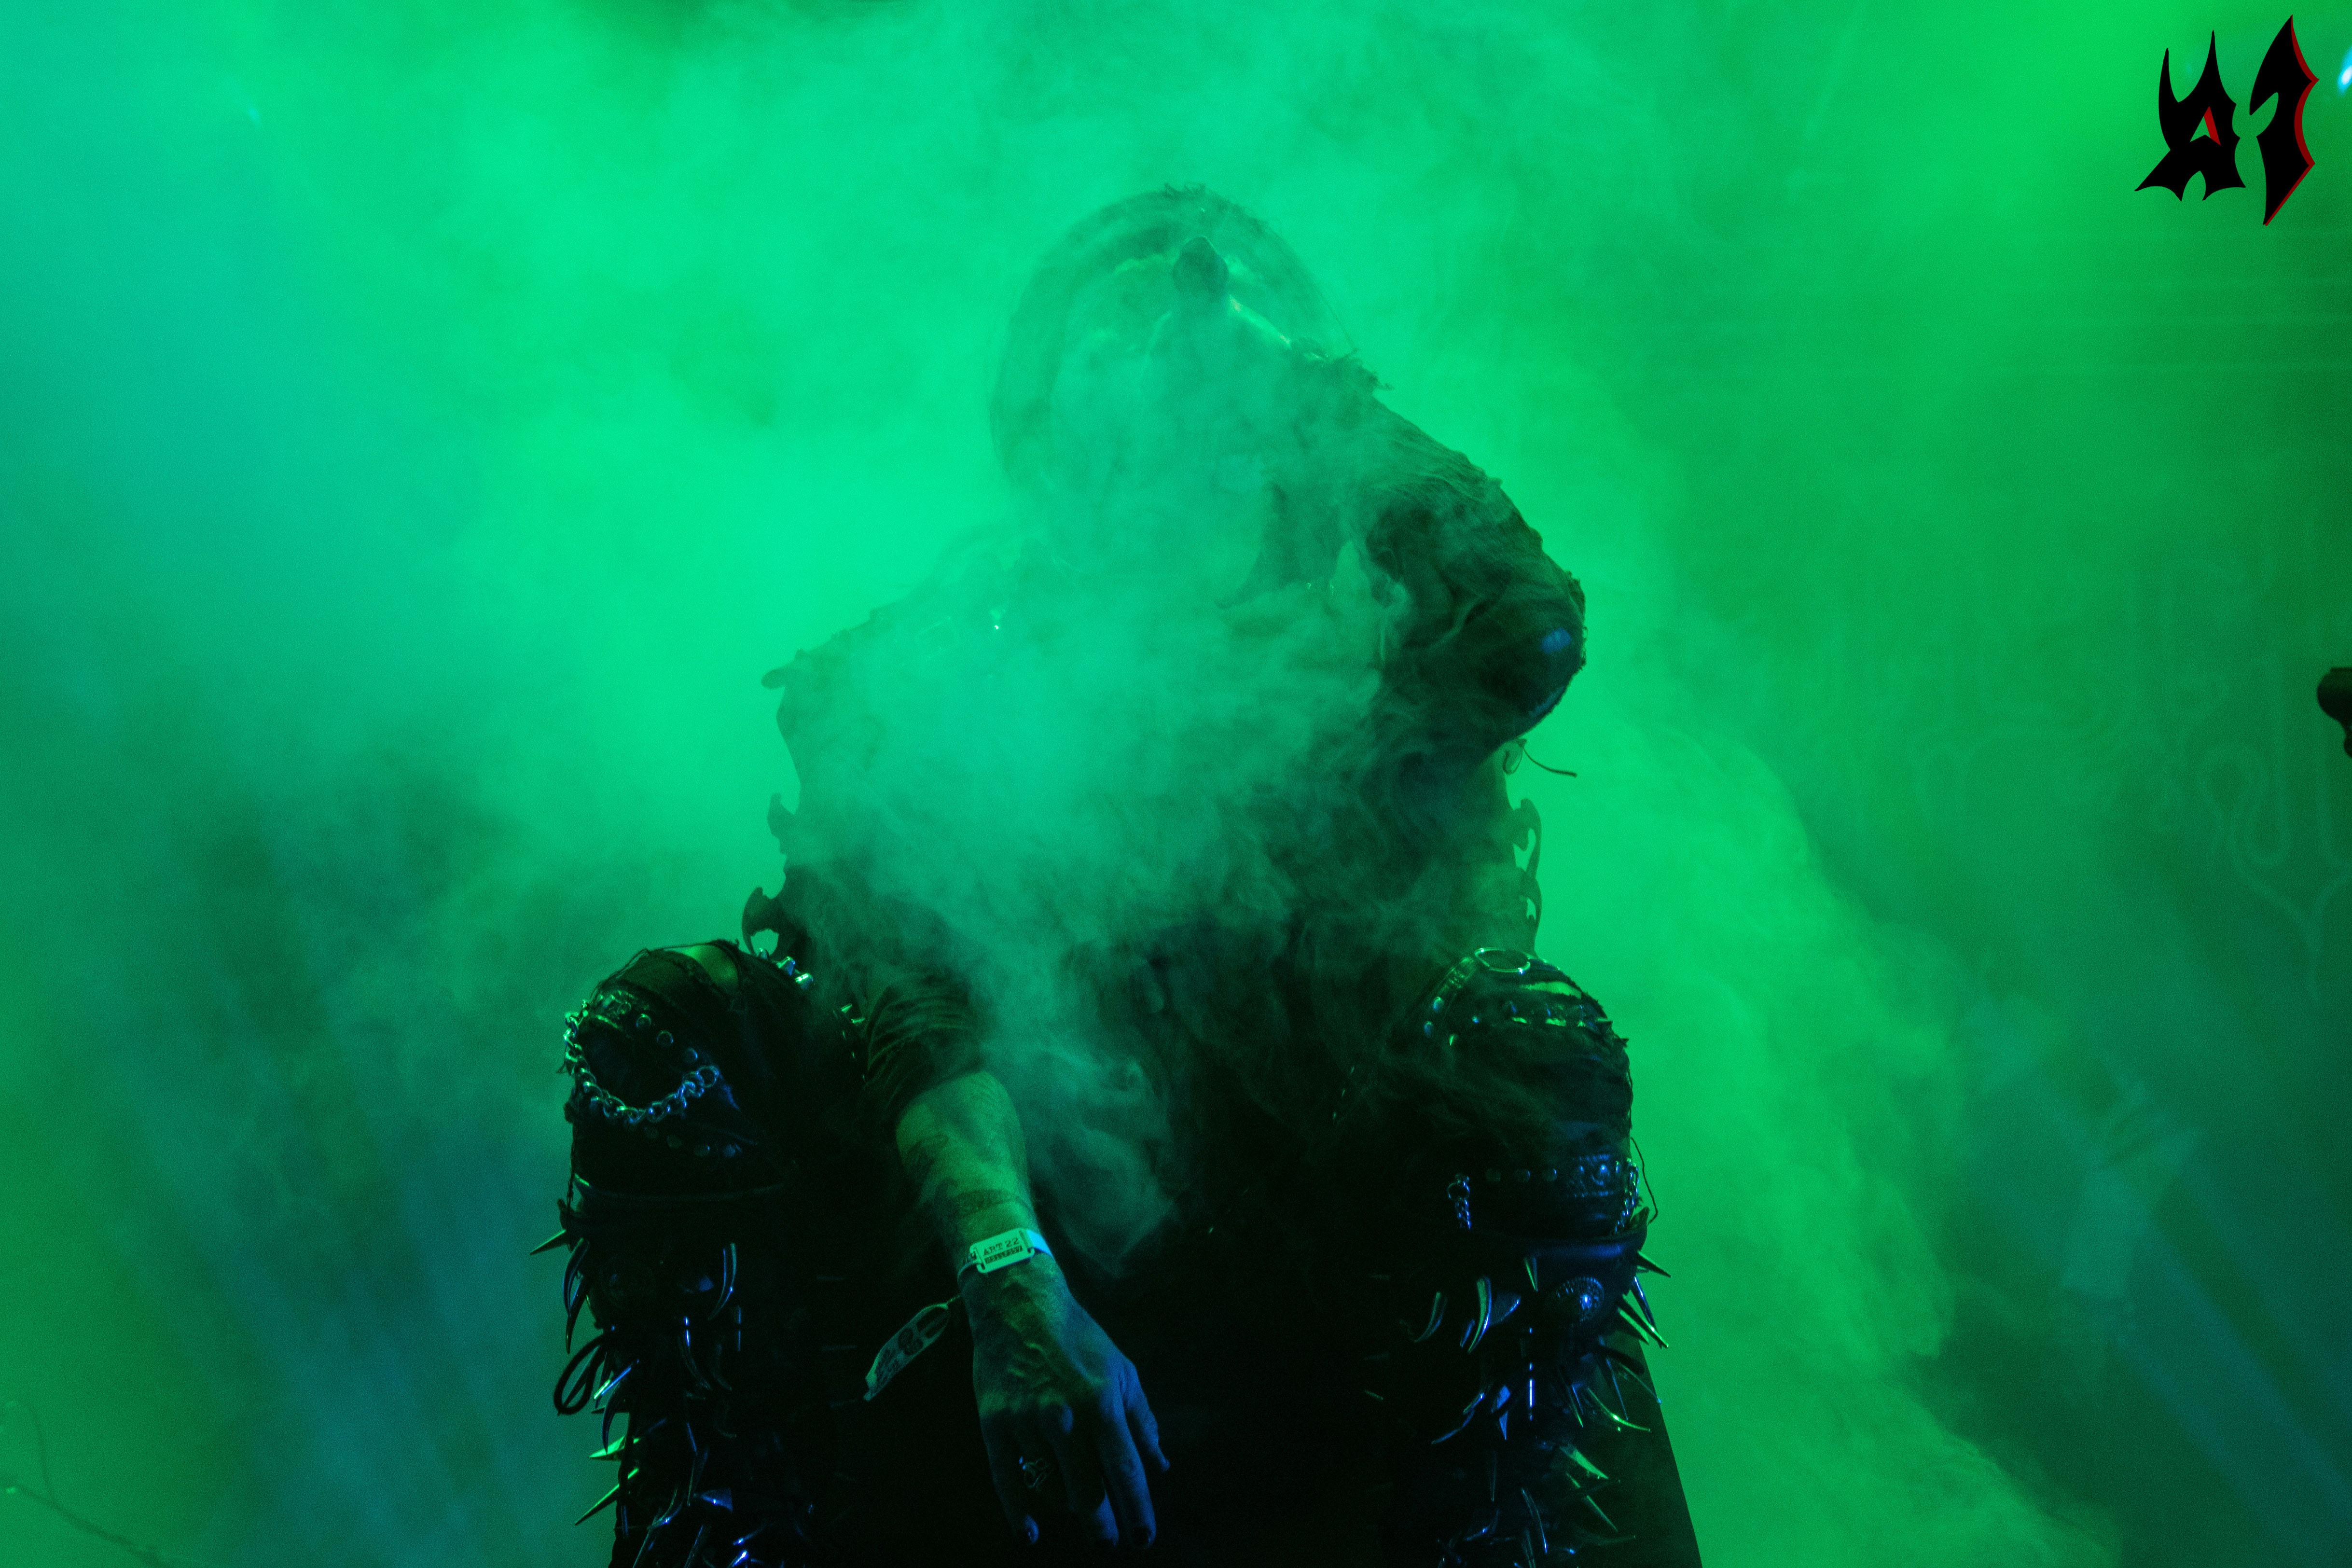 Hellfest - Cradle Of Filth - 25